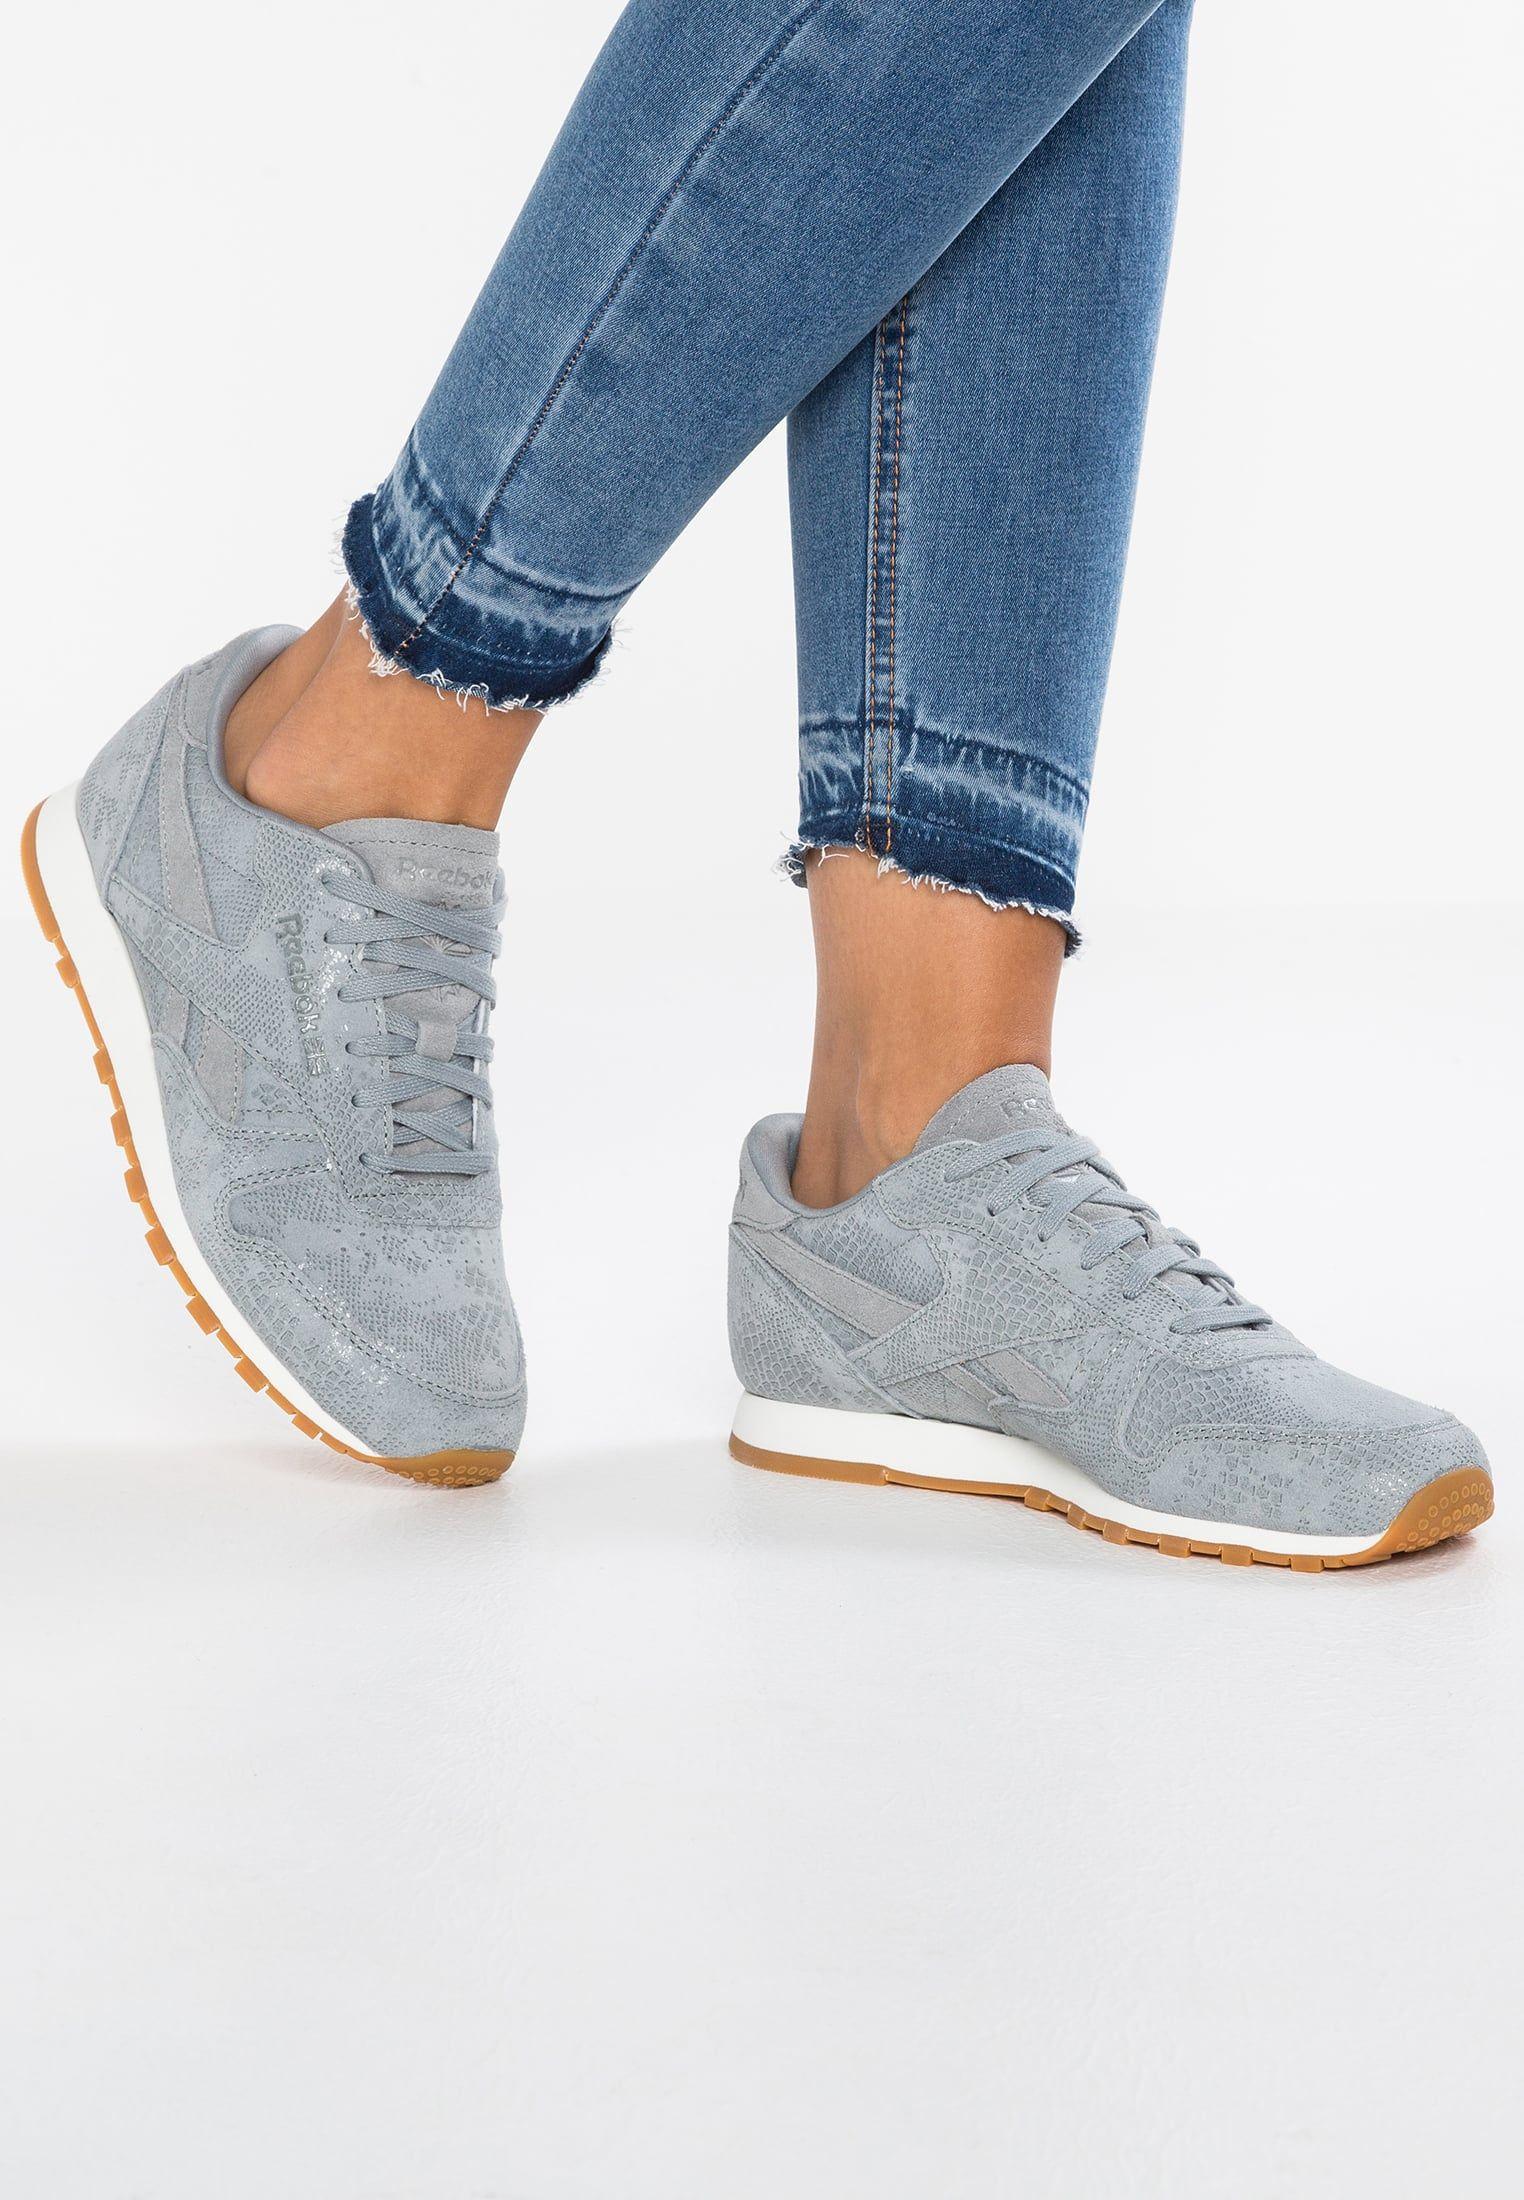 25e5ad900298e Chaussures Reebok Classic CLASSIC CLEAN EXOTICS - Baskets basses - flint  grey chalk gris  89